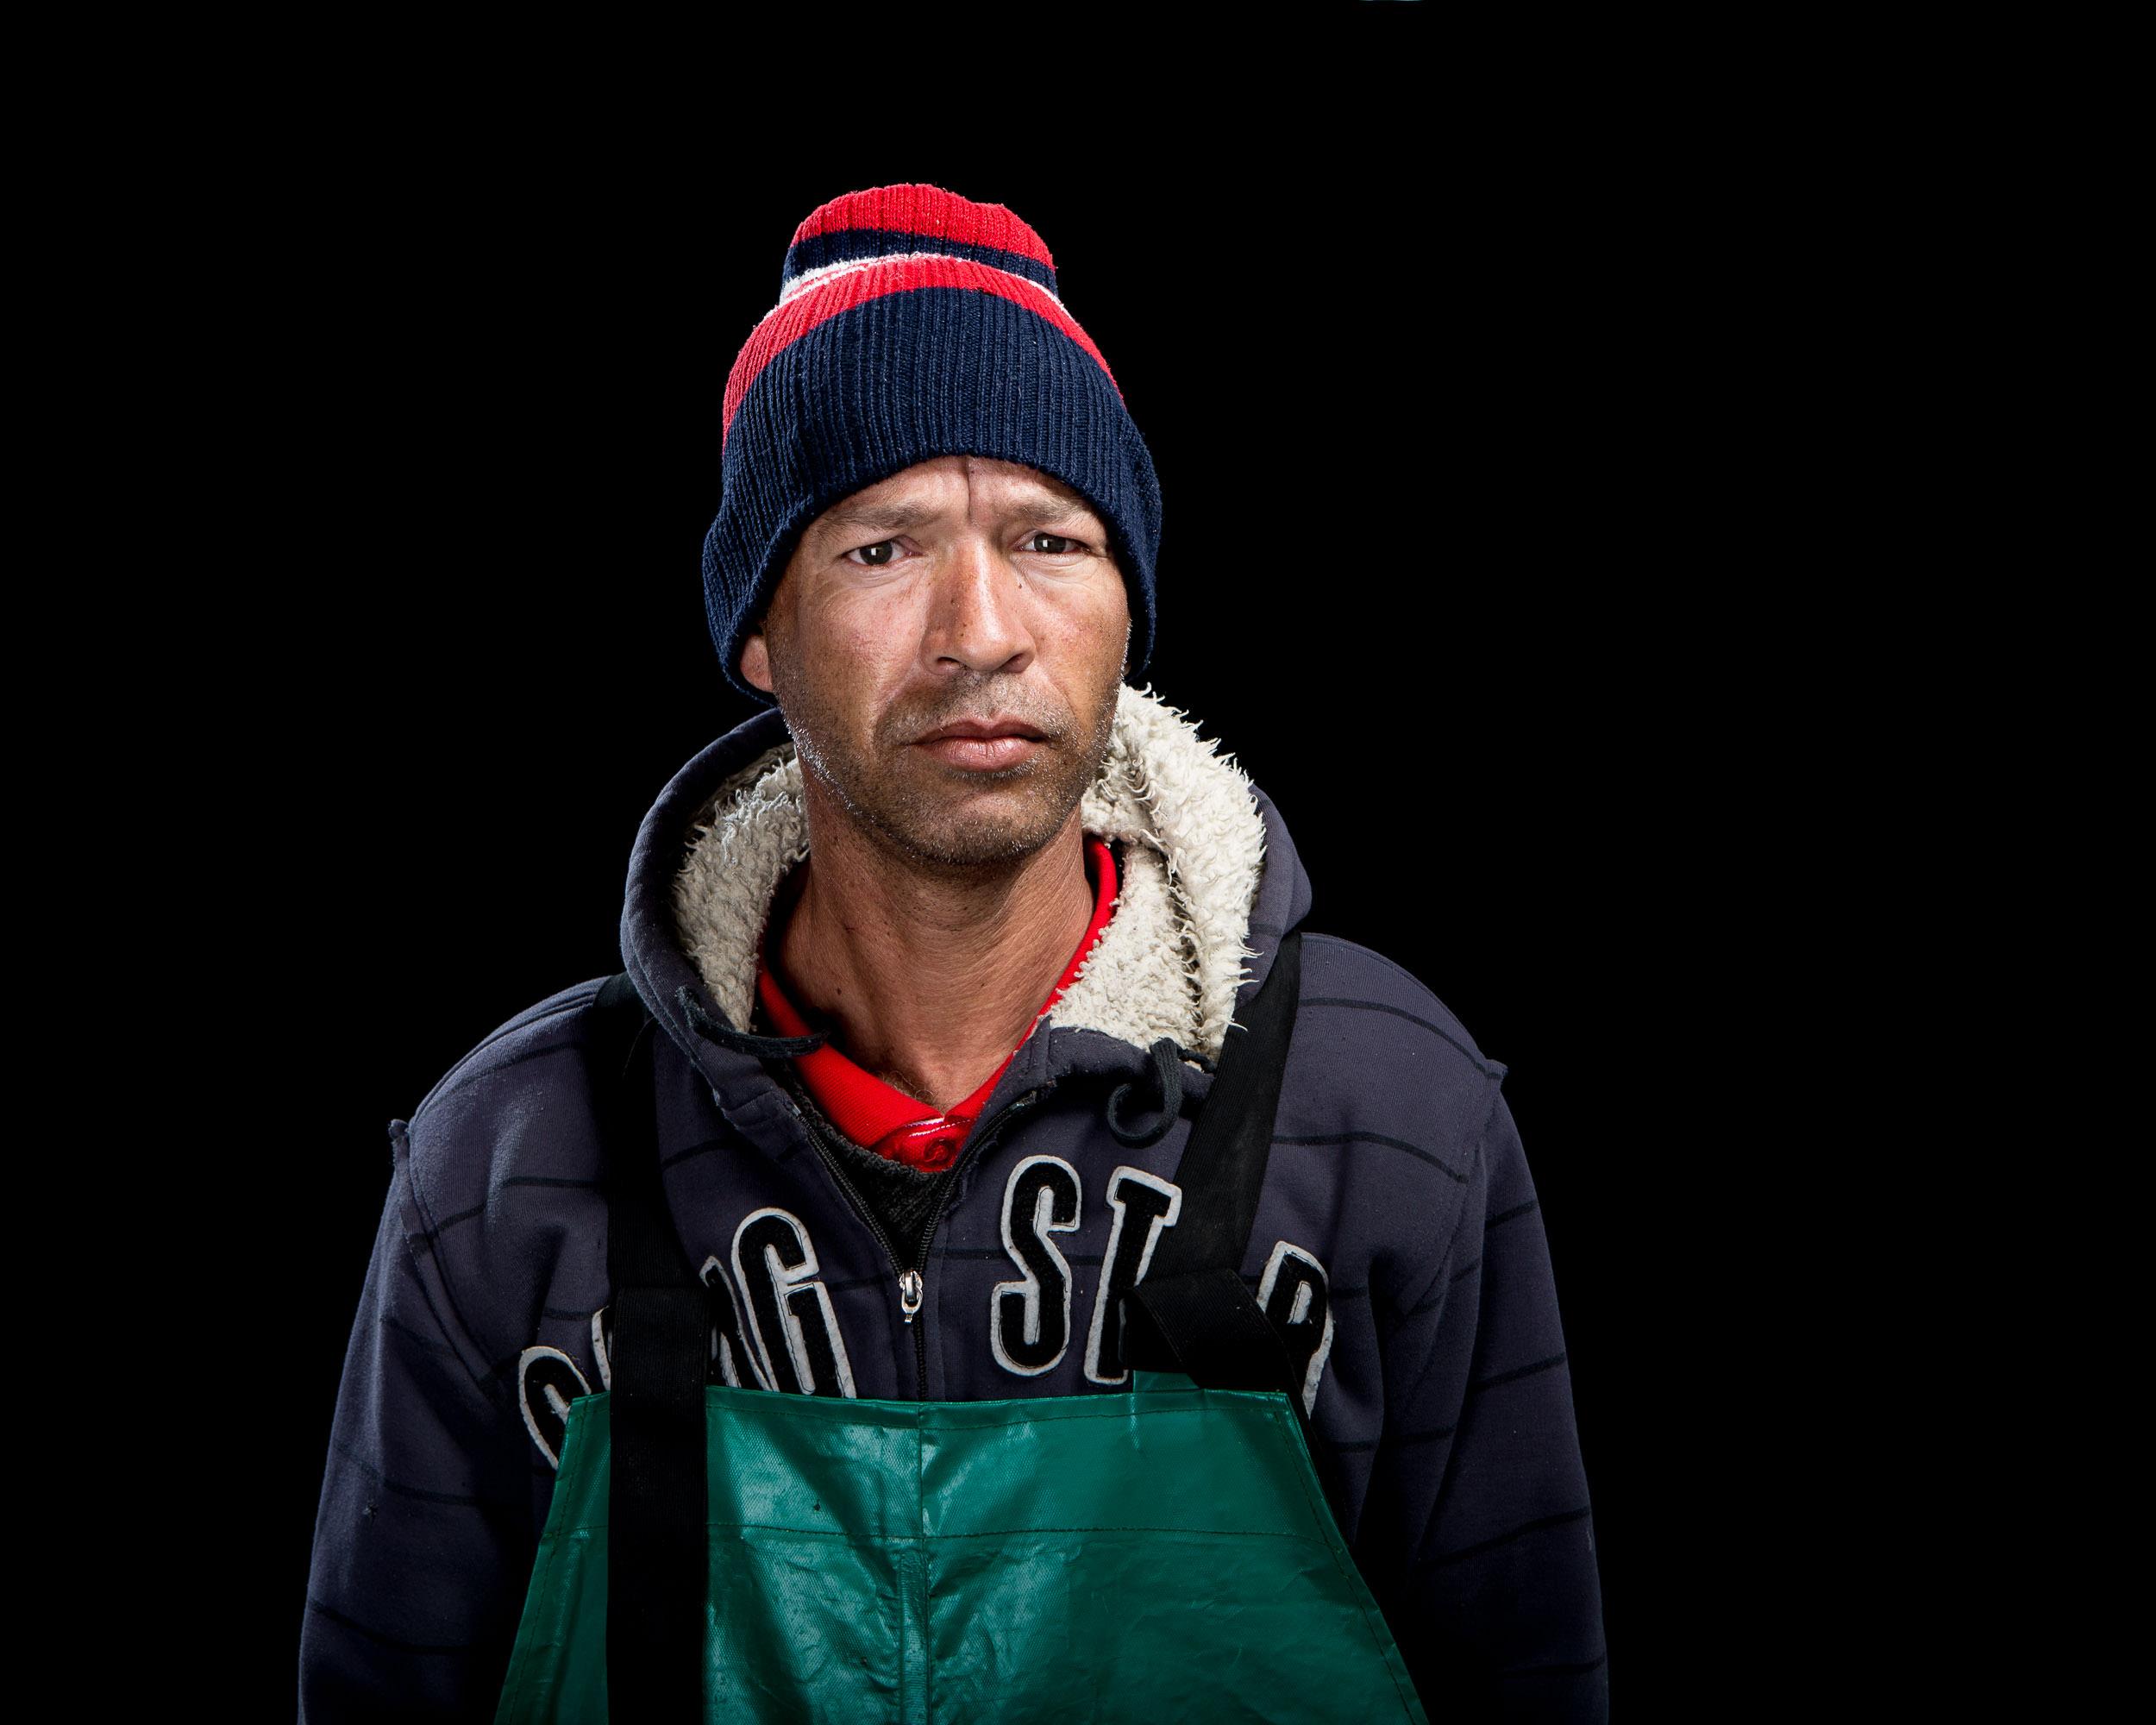 Traditional handline fisherman Garth Henry